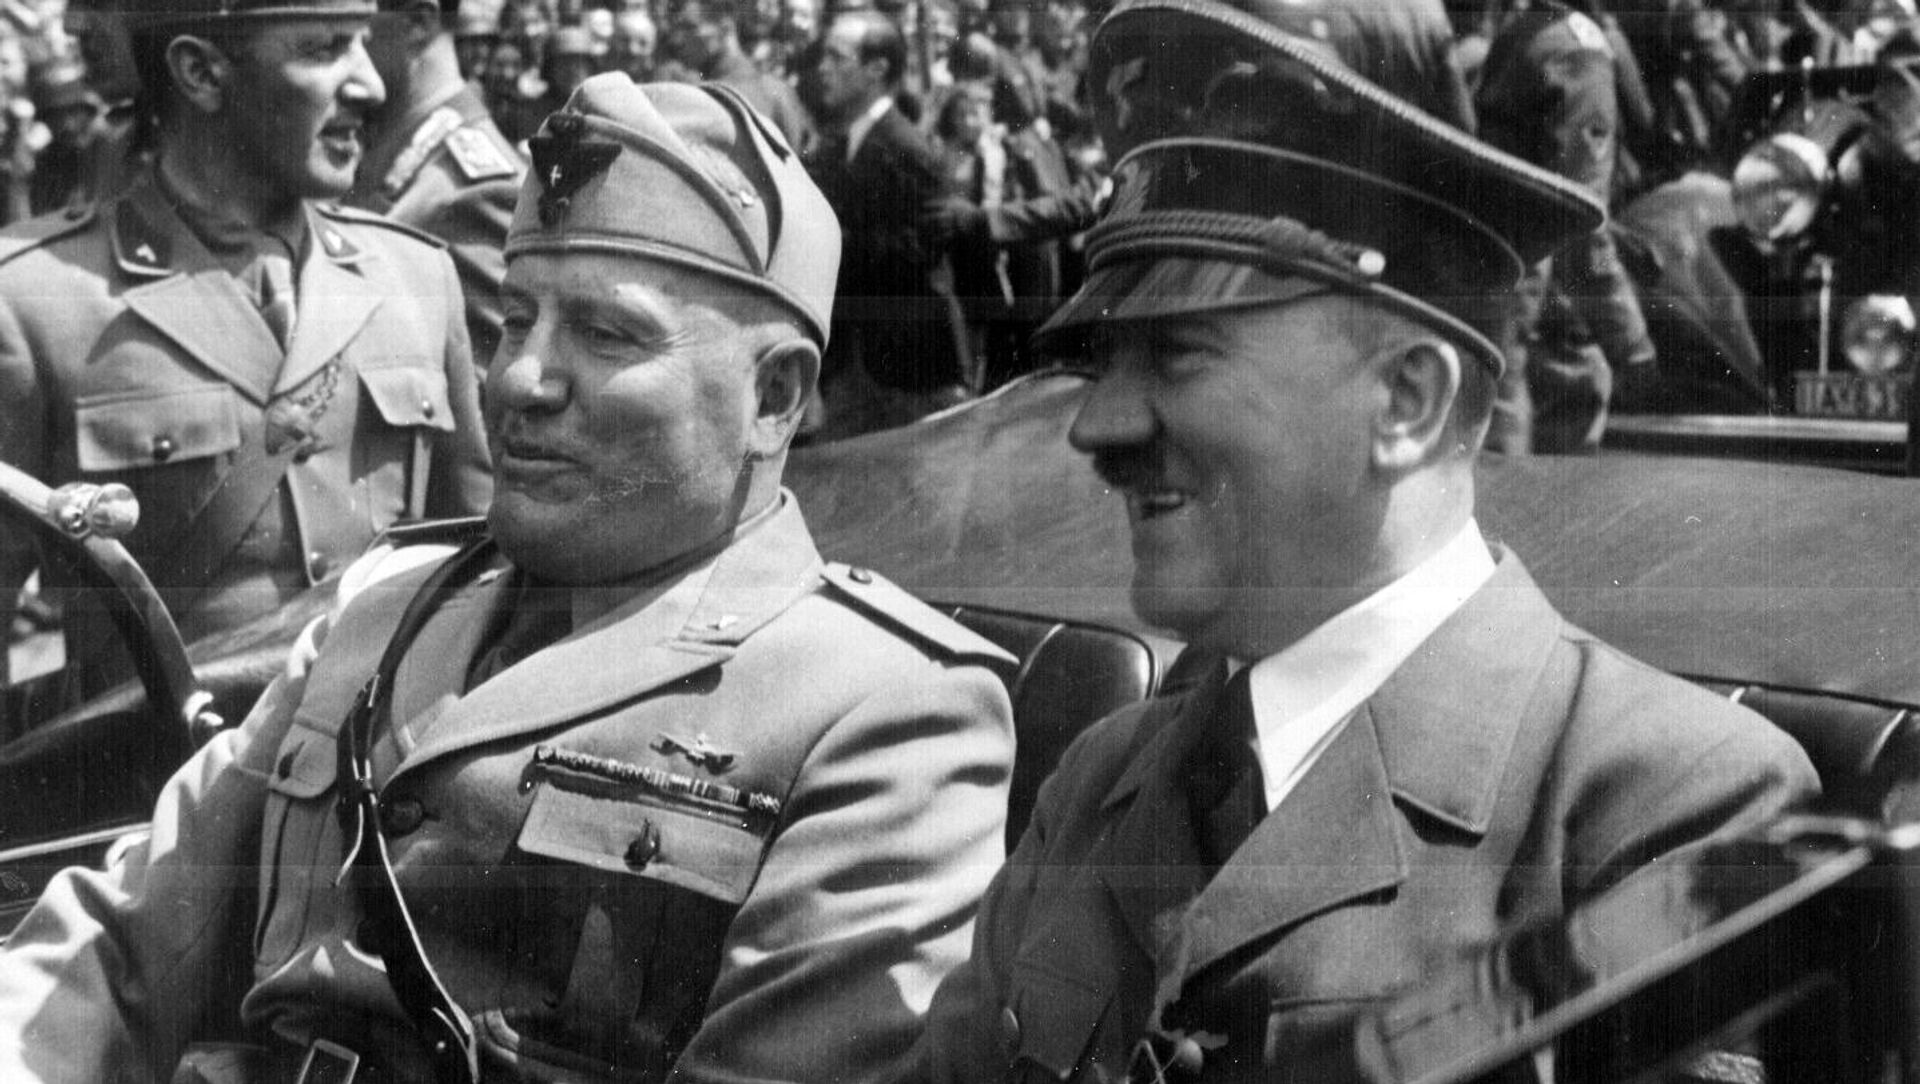 Adolf Hitler y Benito Mussolini en Múnich, Alemania - Sputnik Mundo, 1920, 18.12.2020